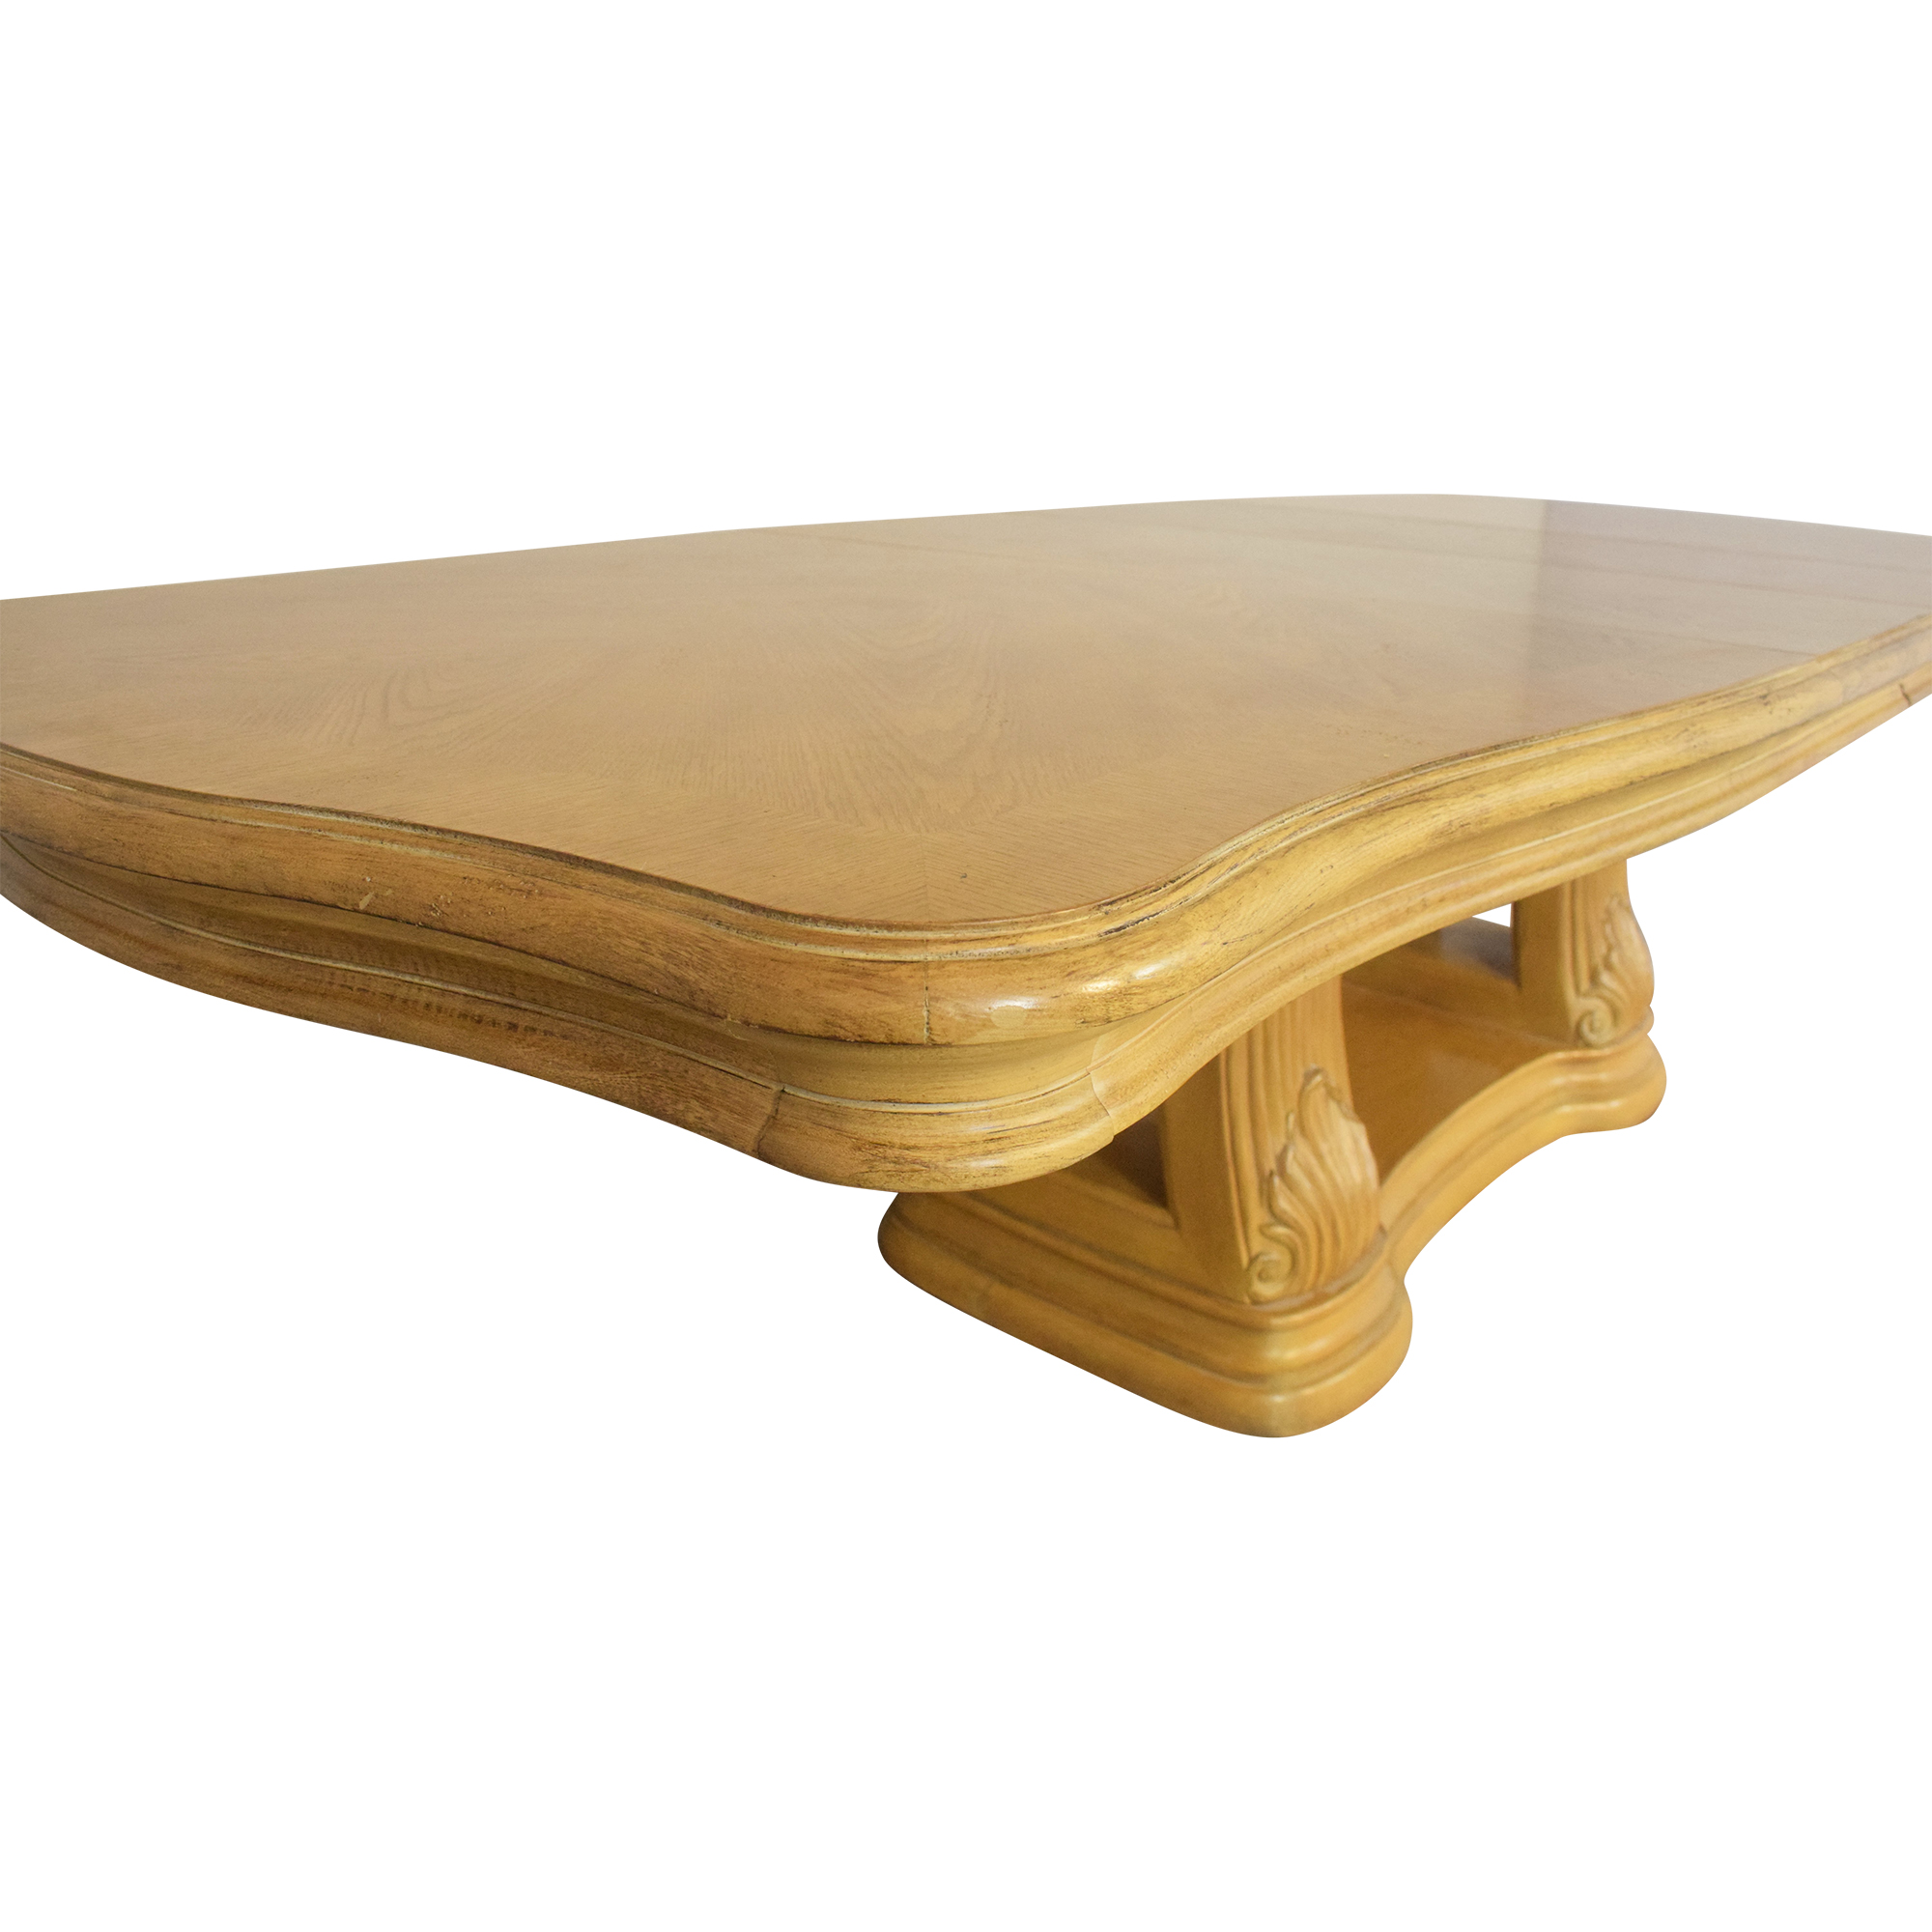 Bernhardt Bernhardt Extension Dining Table used